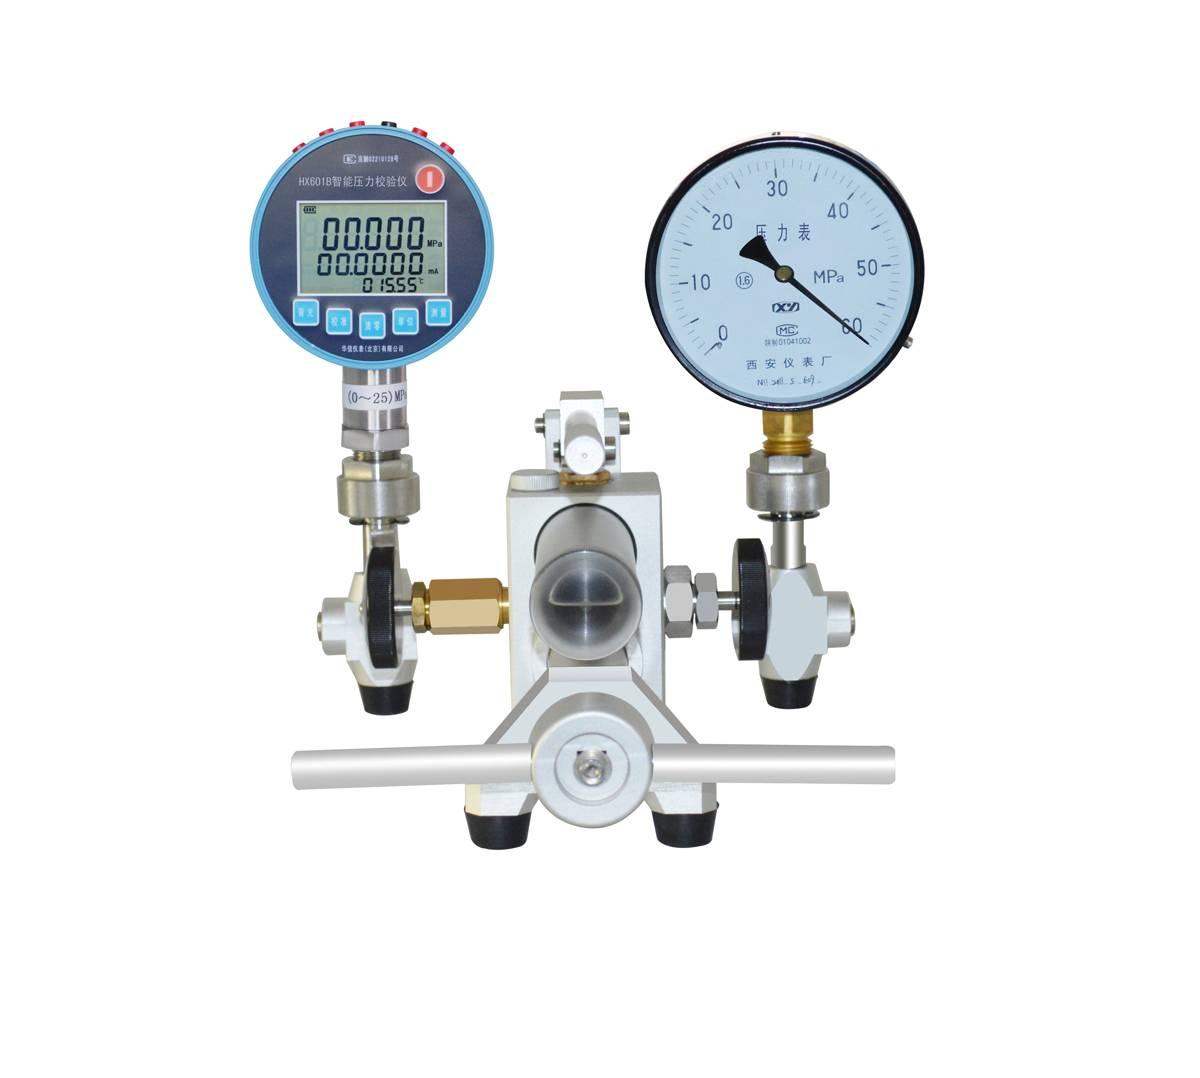 HS705 Hydraulic pressure pump / portable